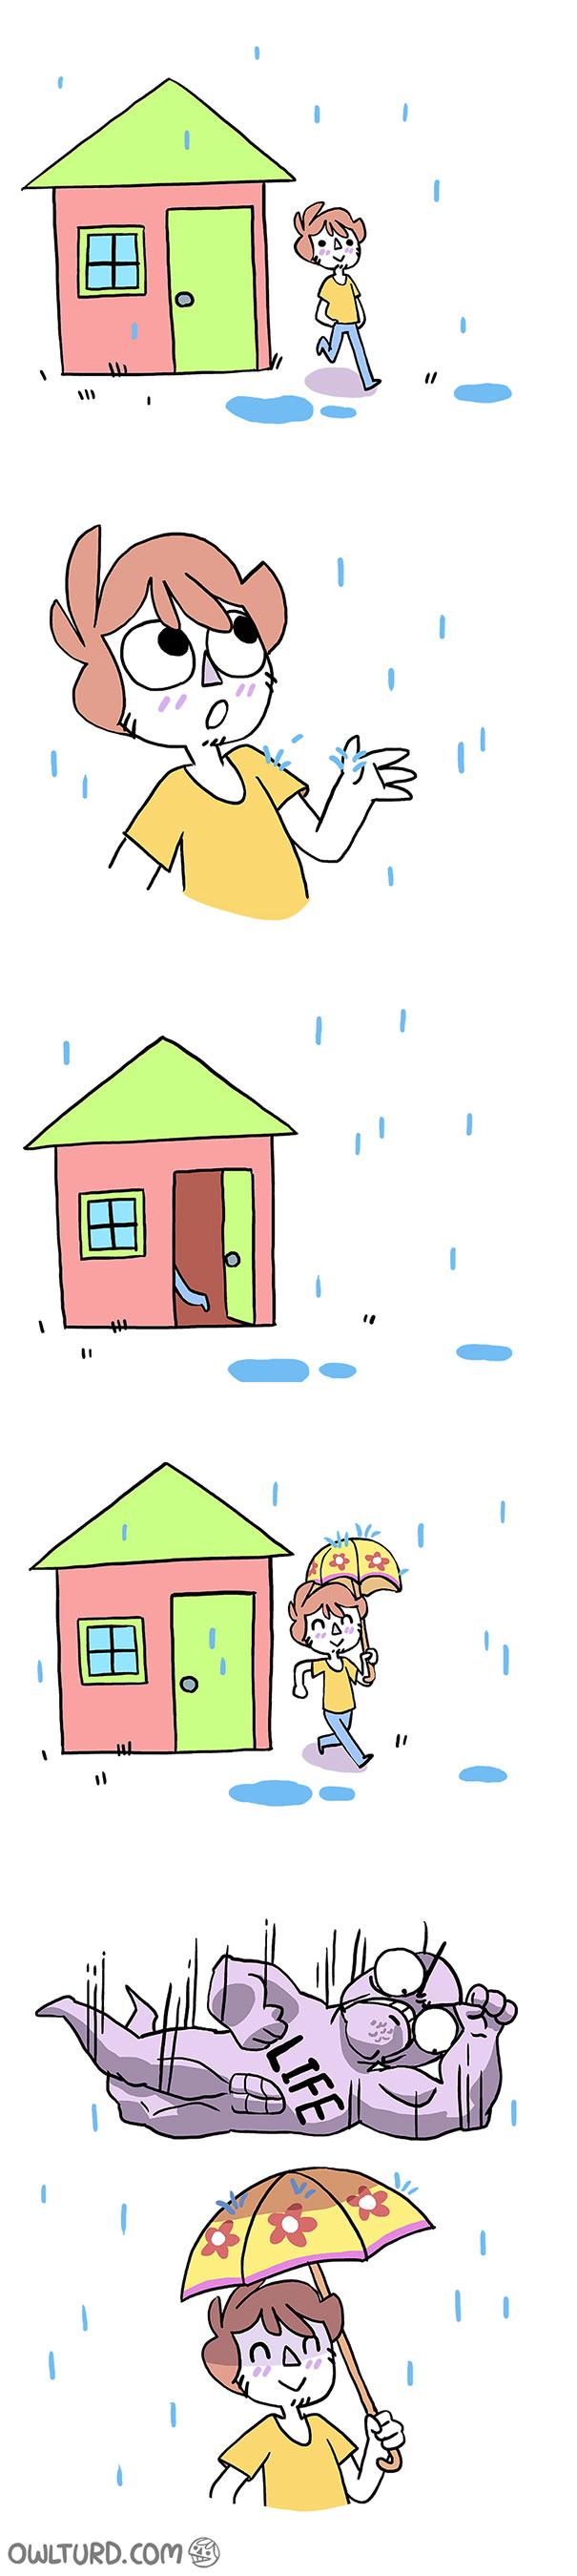 Umbrellas Are Nice